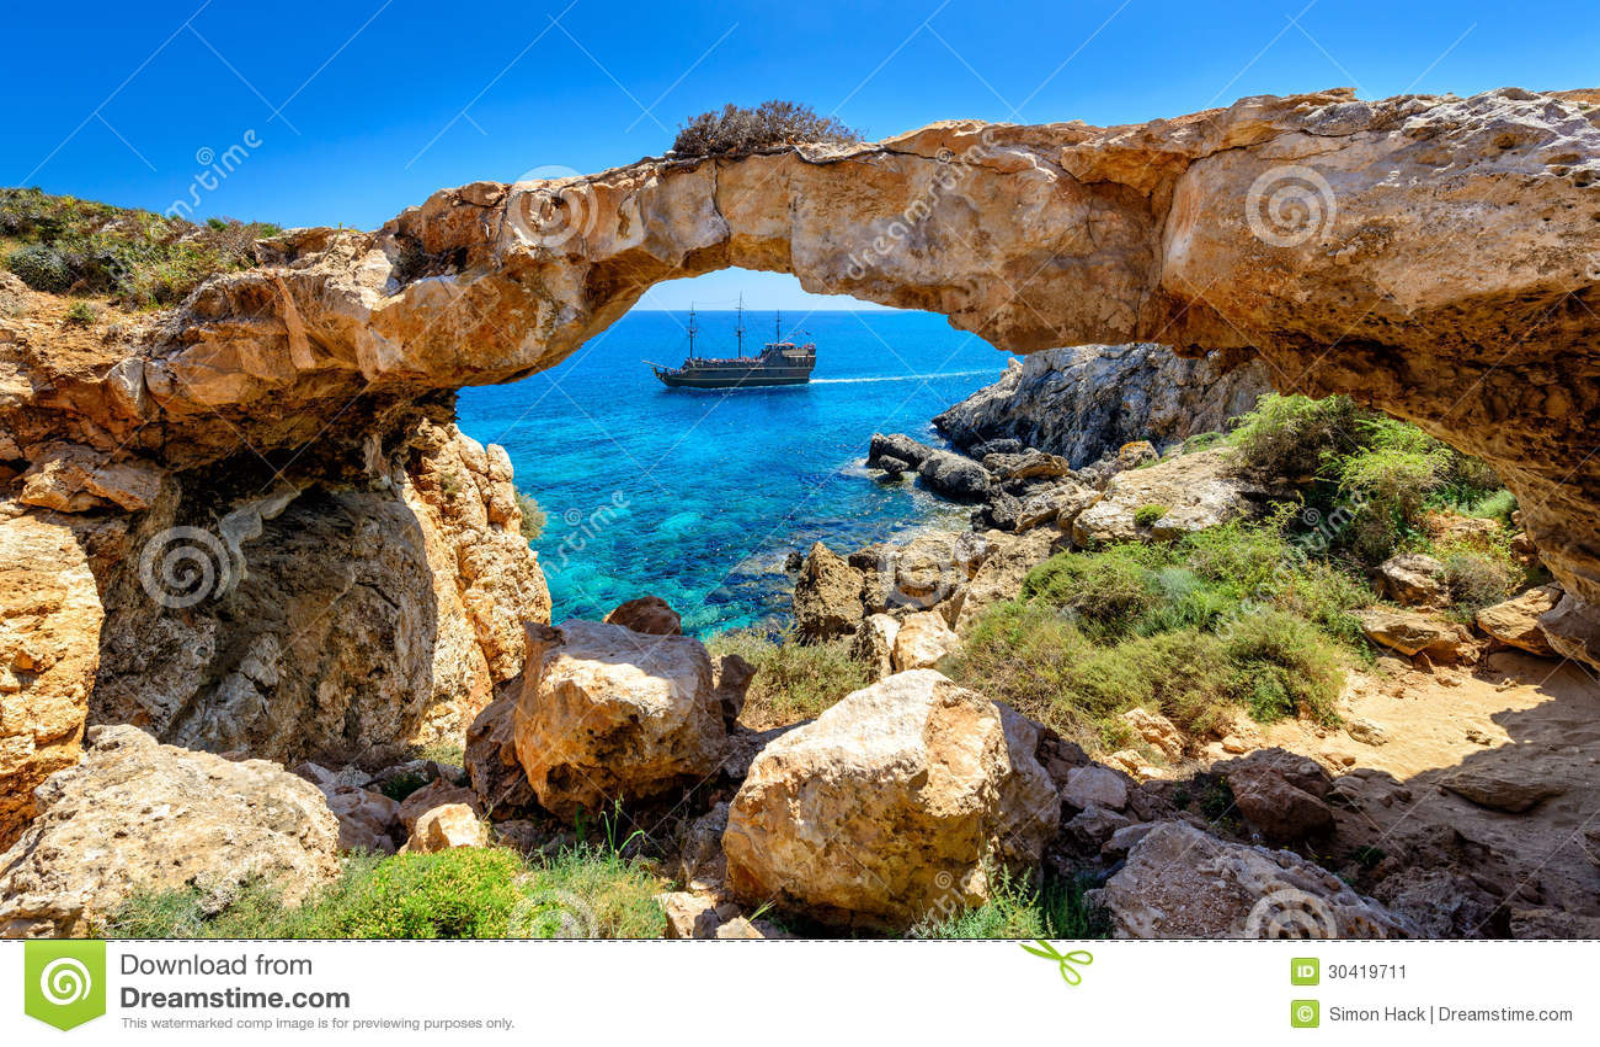 Pirate ship through rock arch,cyprus